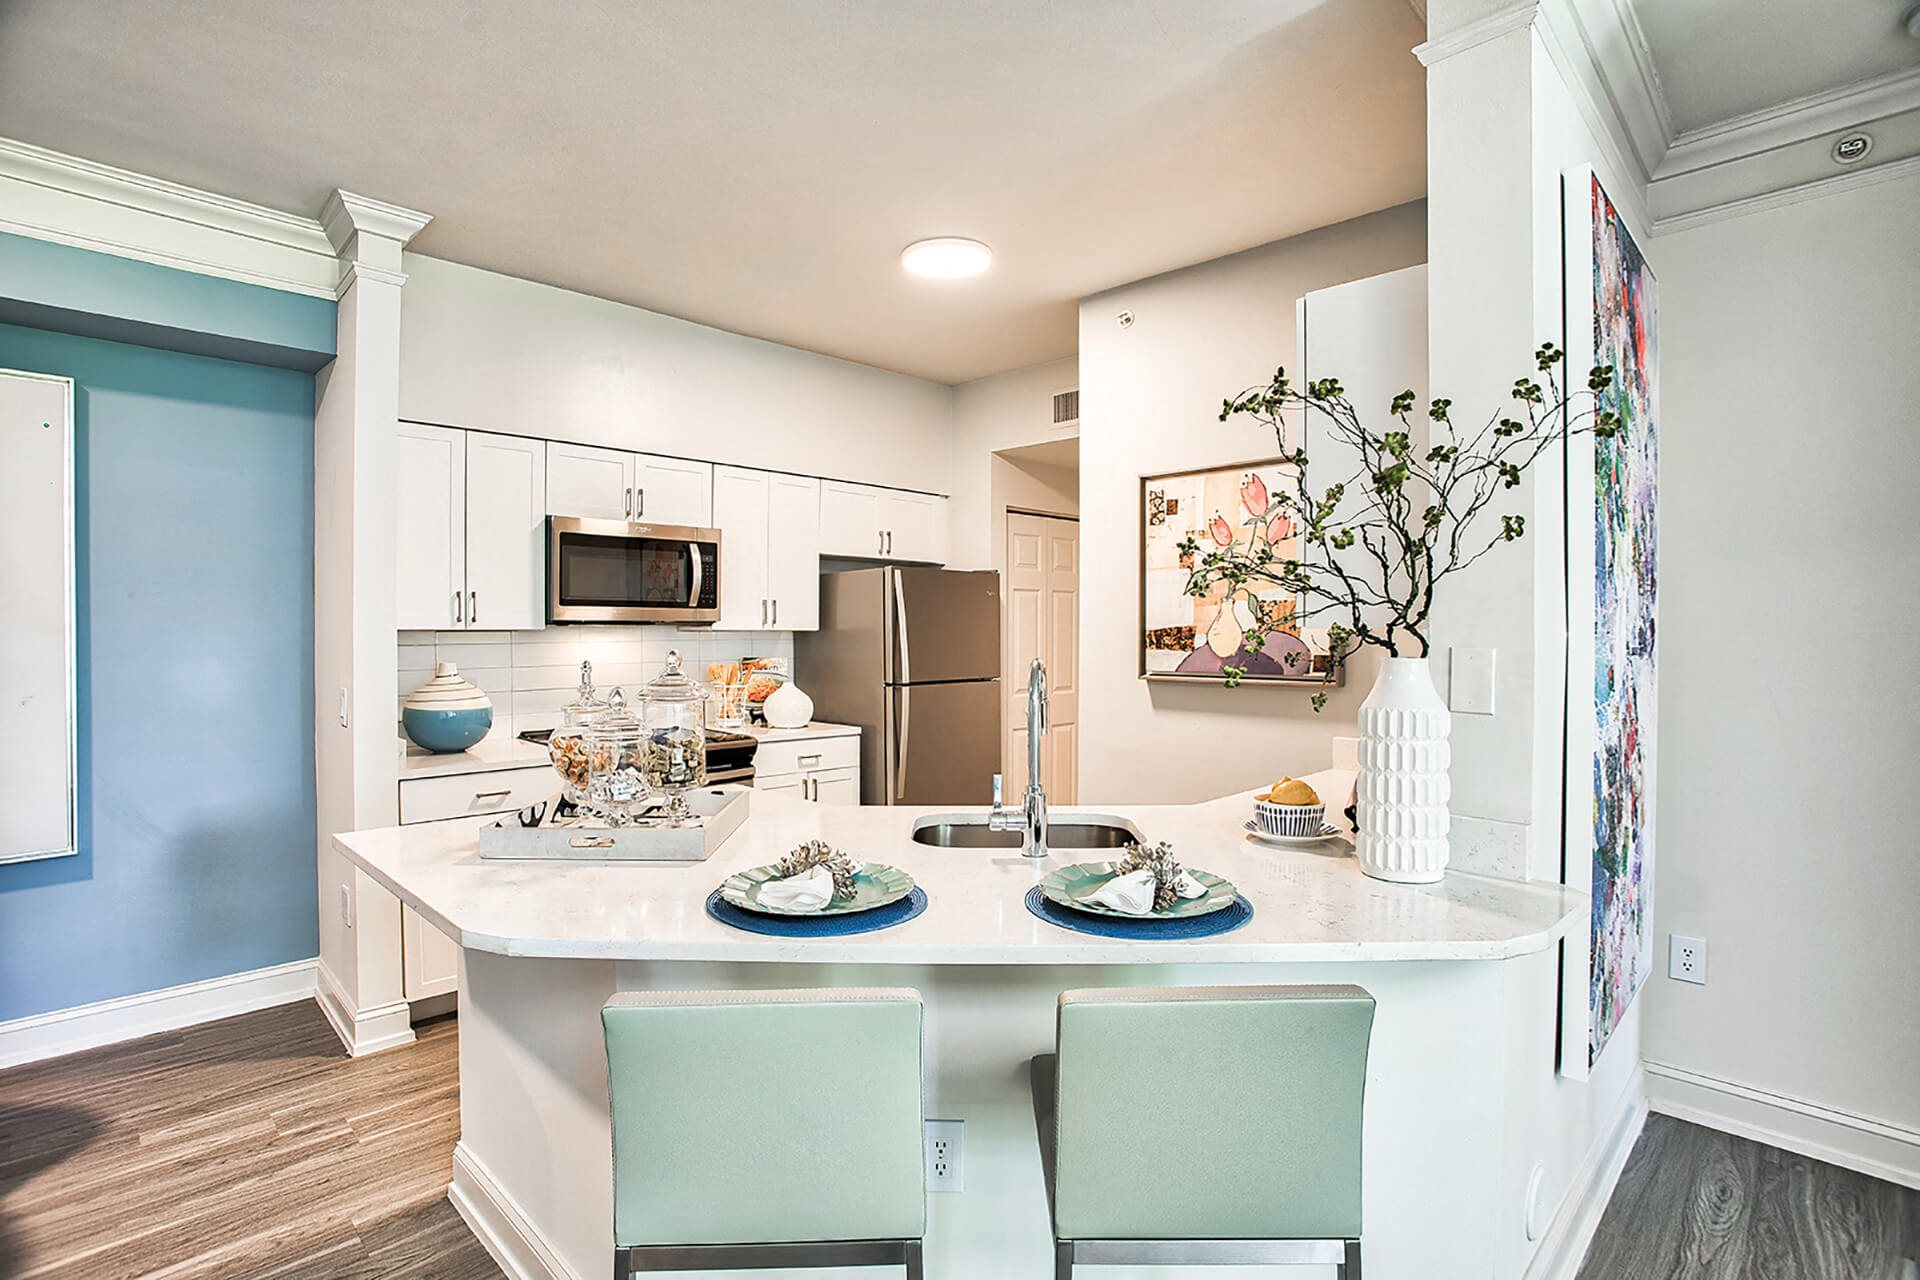 Brand new kitchens feature, at Windsor at Miramar, Miramar, FL